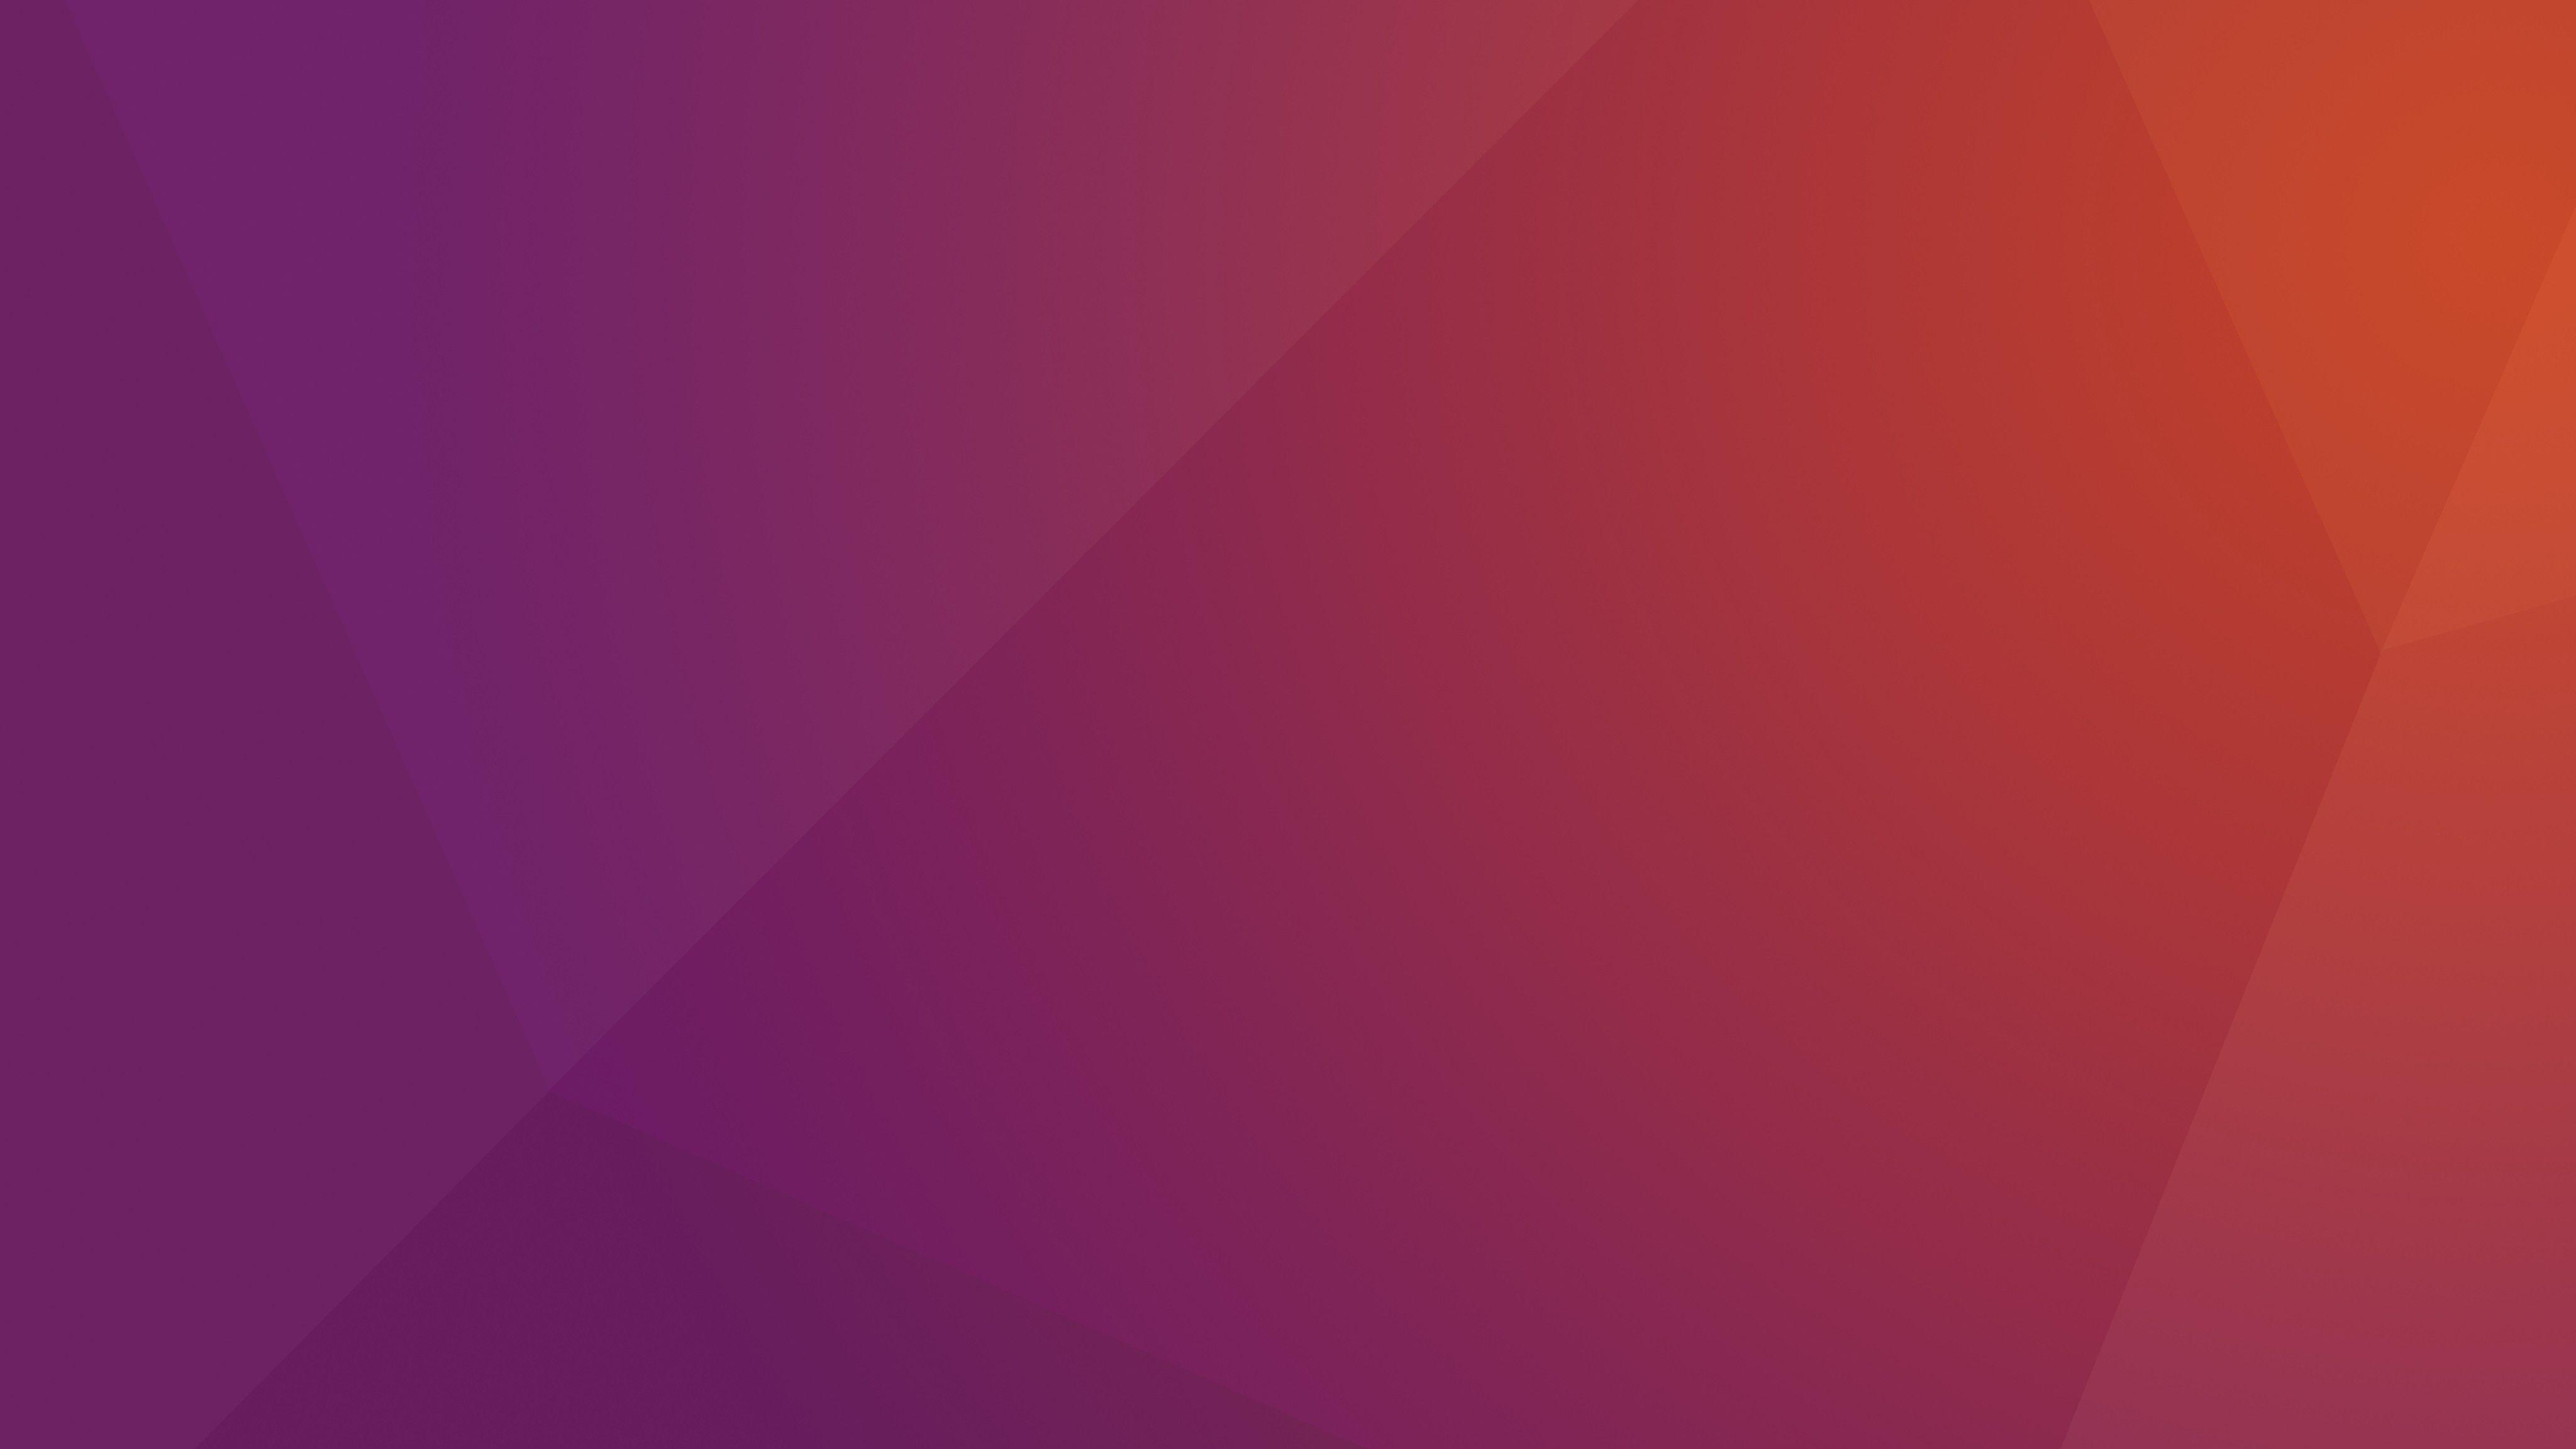 Ubuntu Desktop Backgrounds Wallpaper Orange Wallpaper Hd Wallpaper Desktop Hd Wallpaper